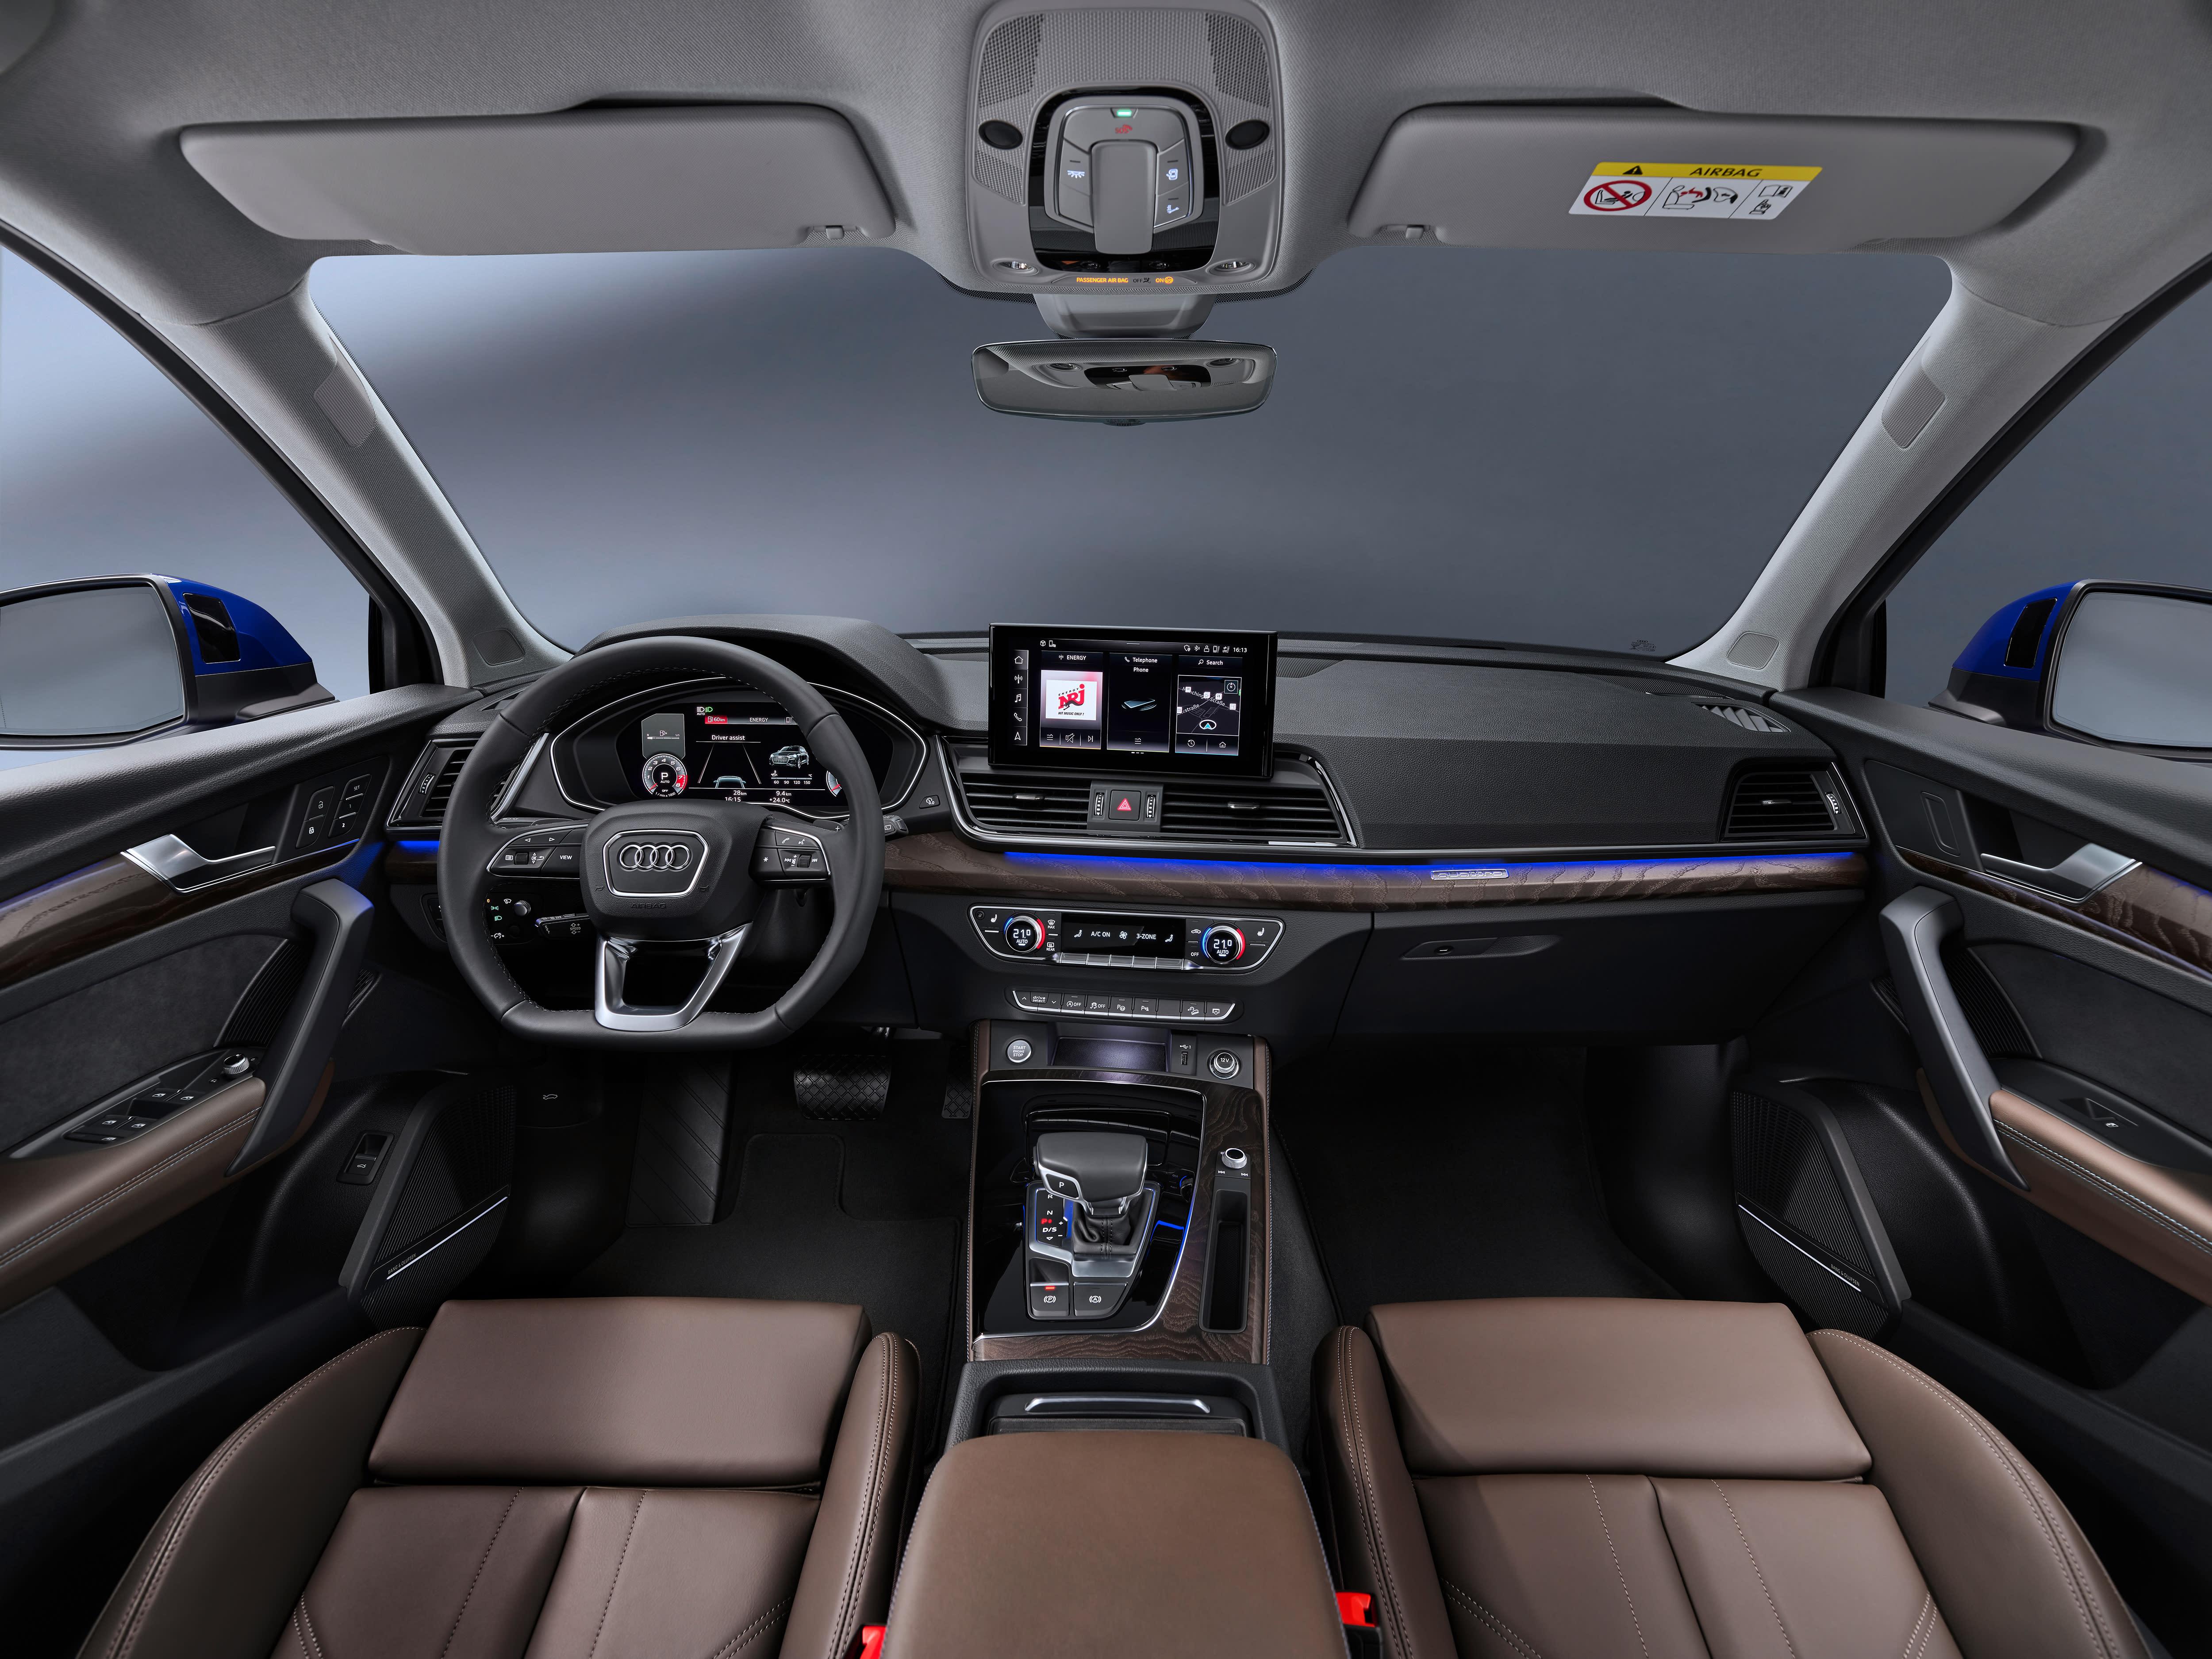 2021 Audi Sq5 Sportback Revealed Australian Launch Due Second Half Of 2021 Caradvice